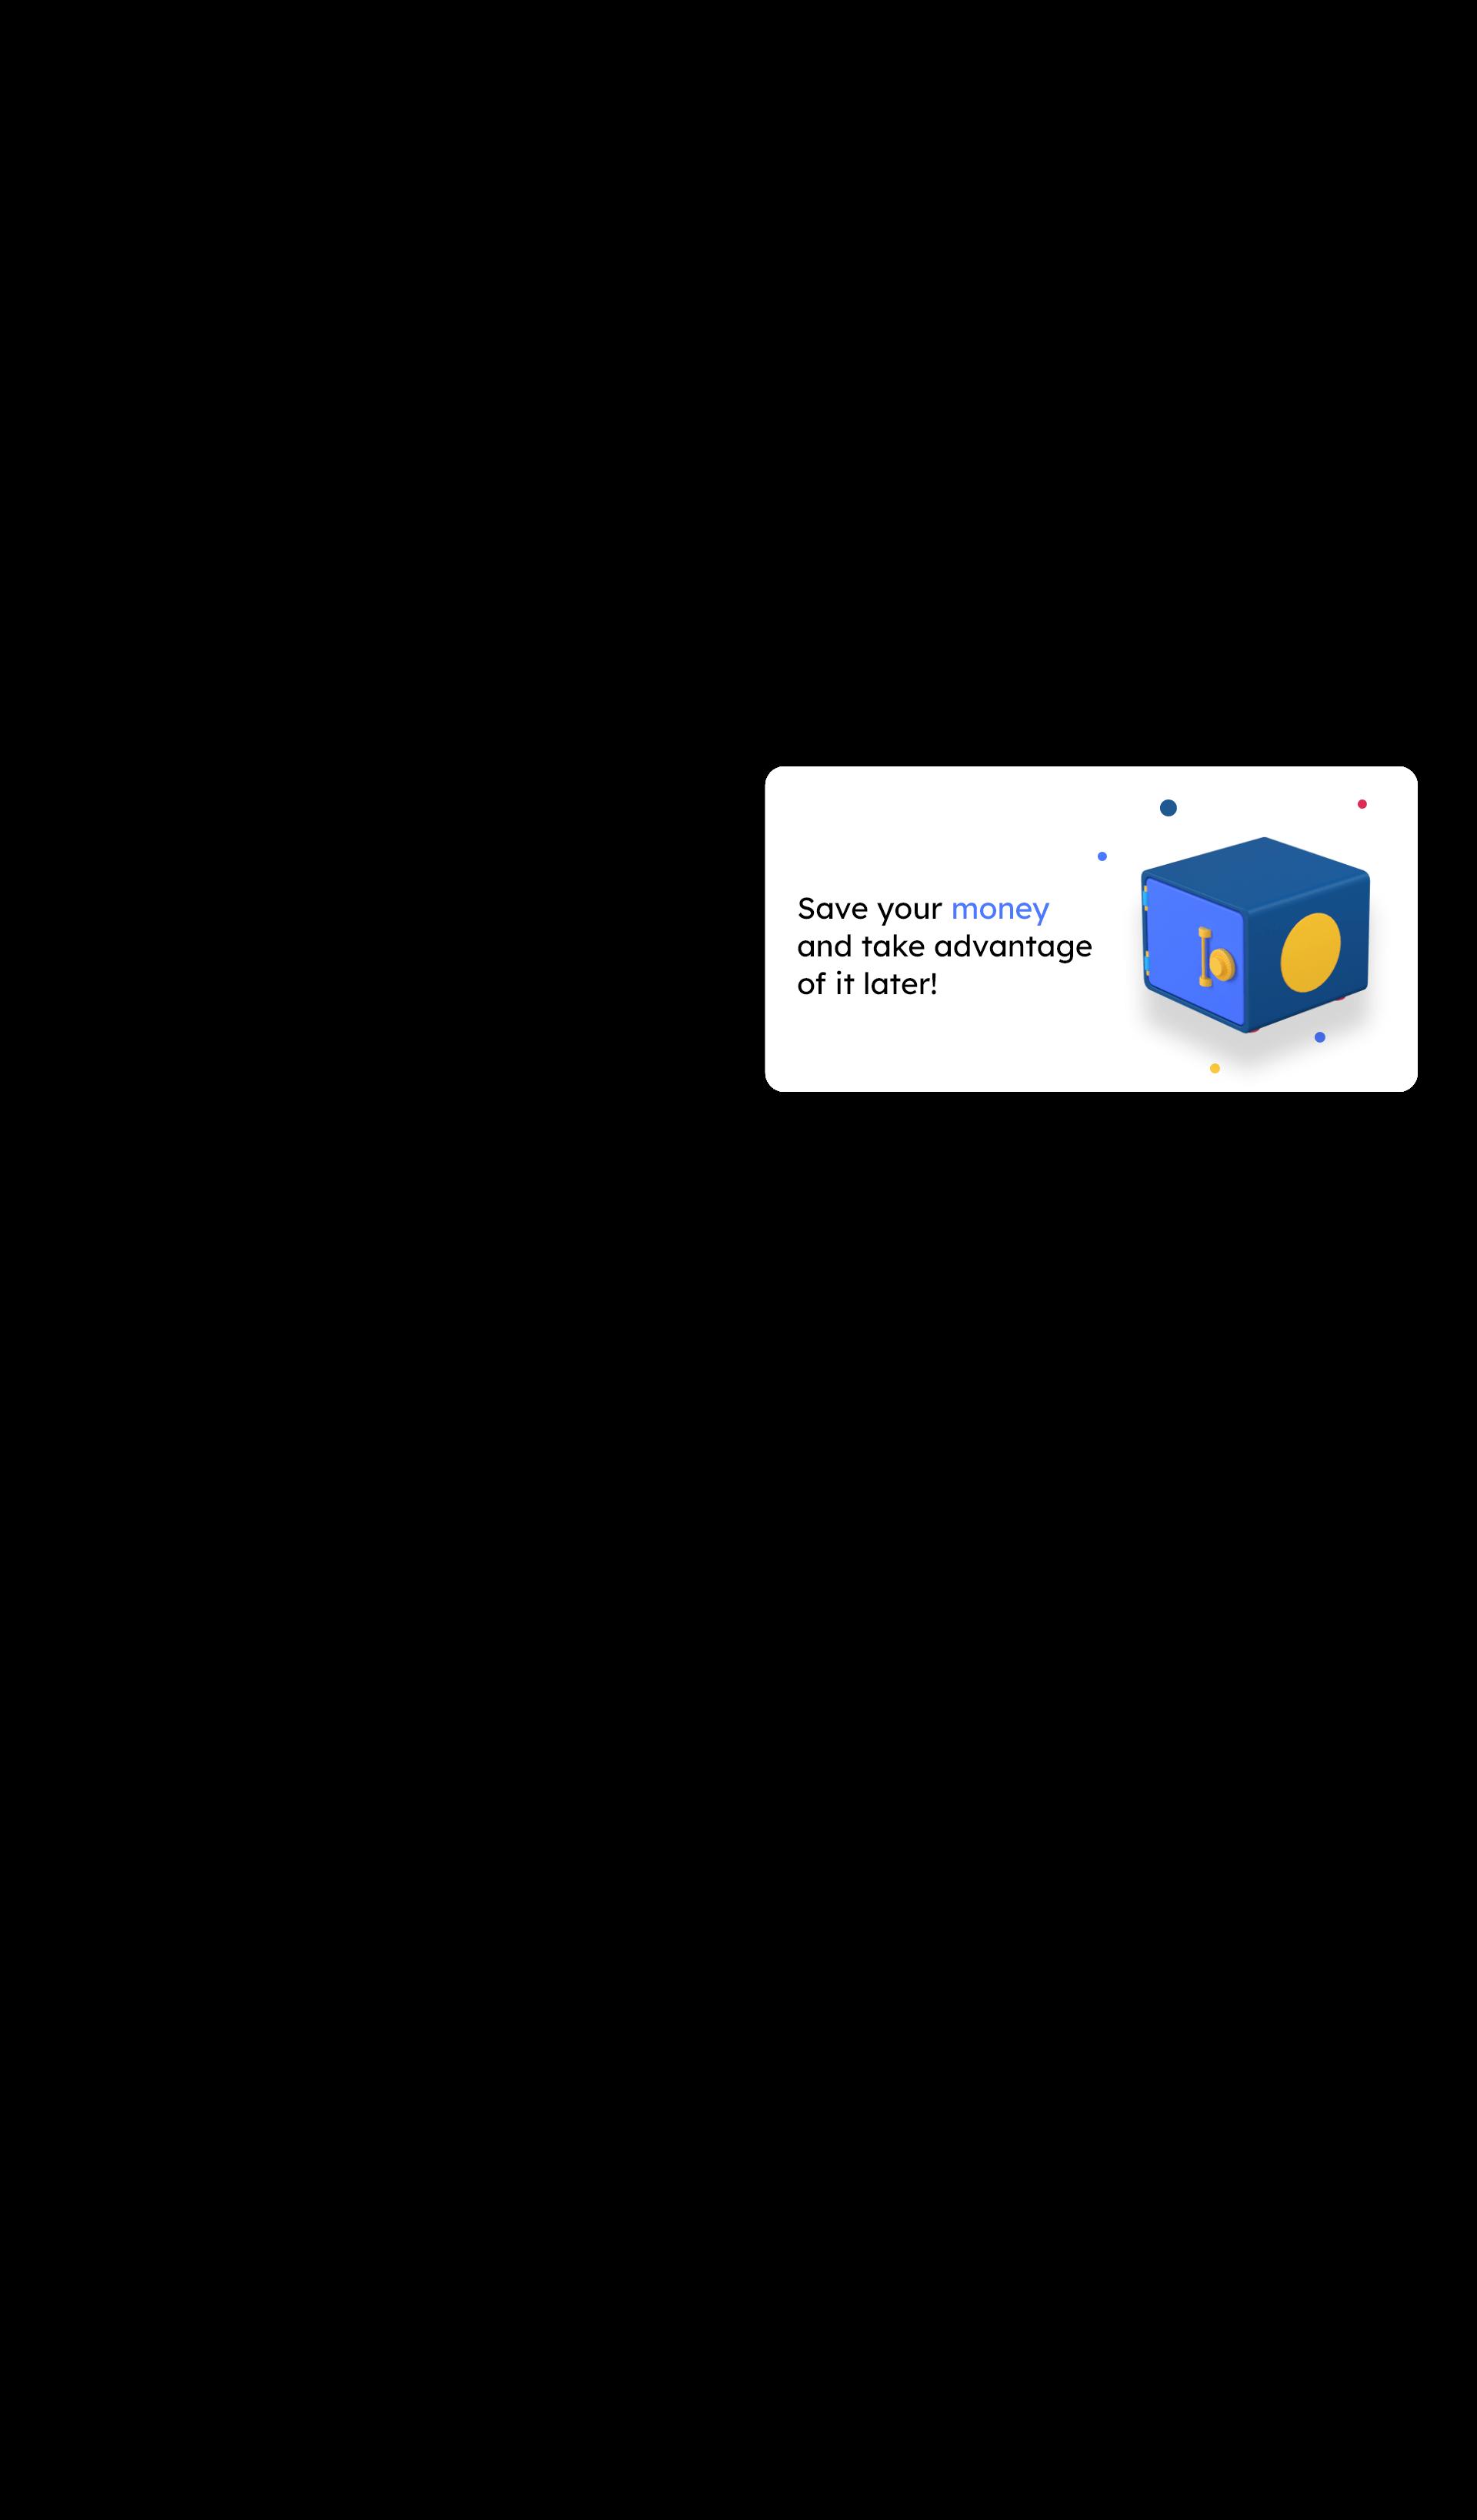 landing application 3d icon set 4